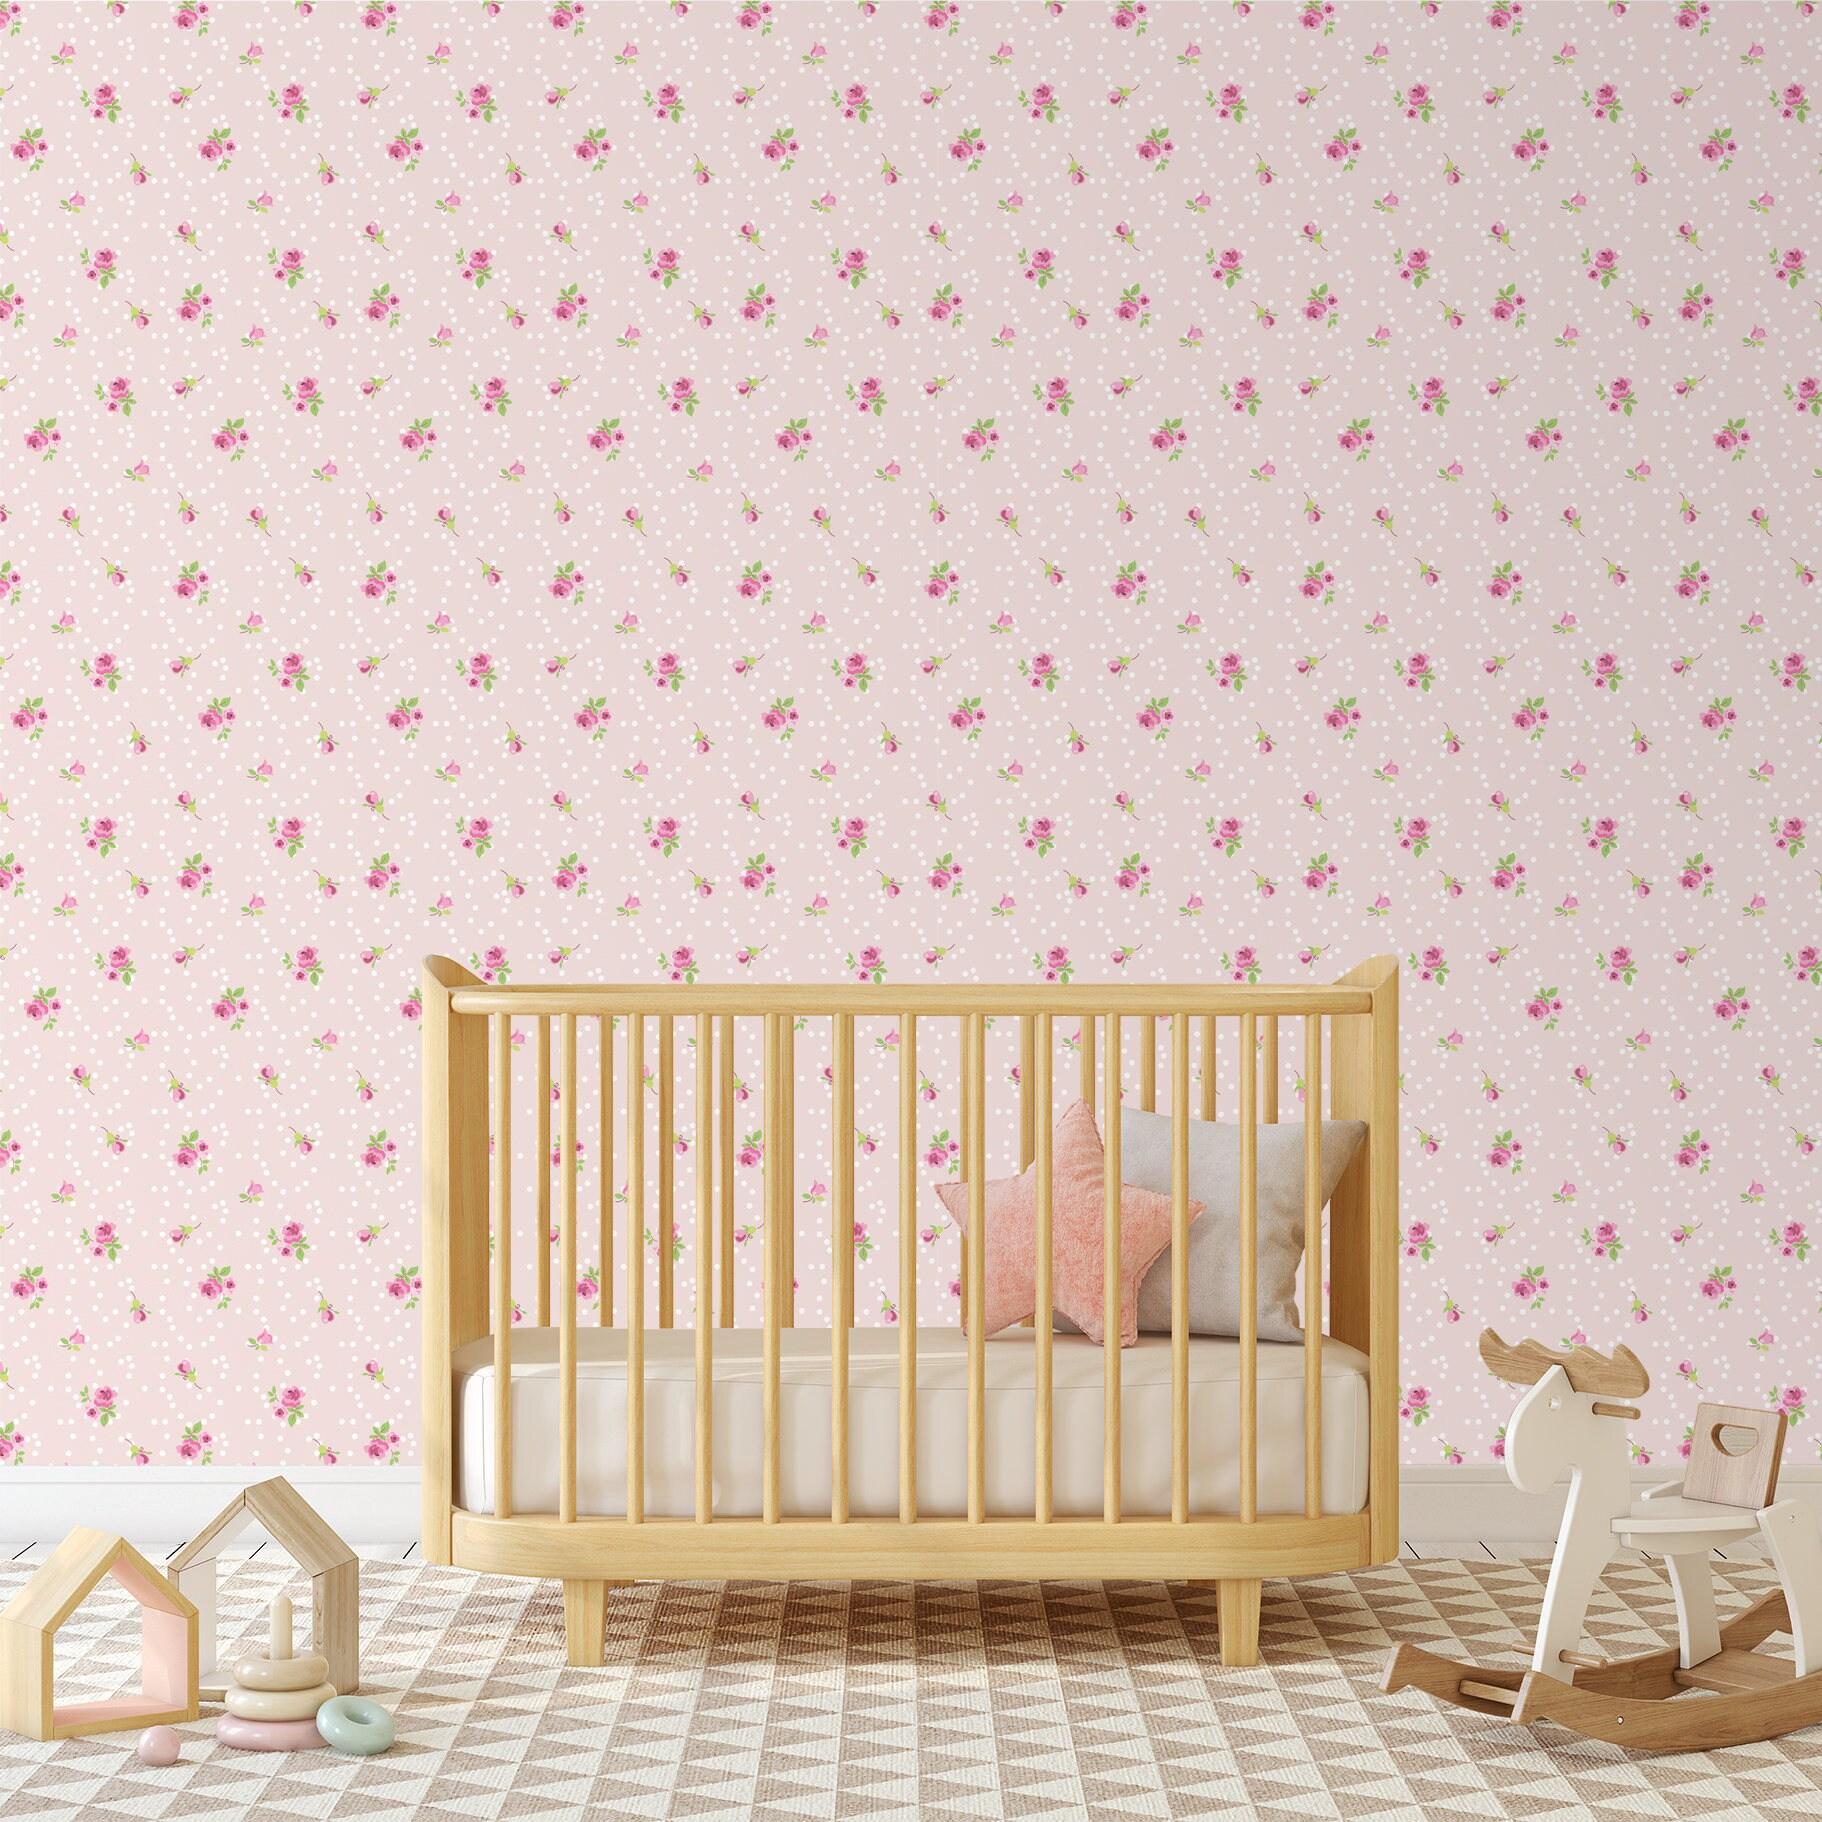 pink removable wallpaper peel and stick wallpaper romantic etsy. Black Bedroom Furniture Sets. Home Design Ideas